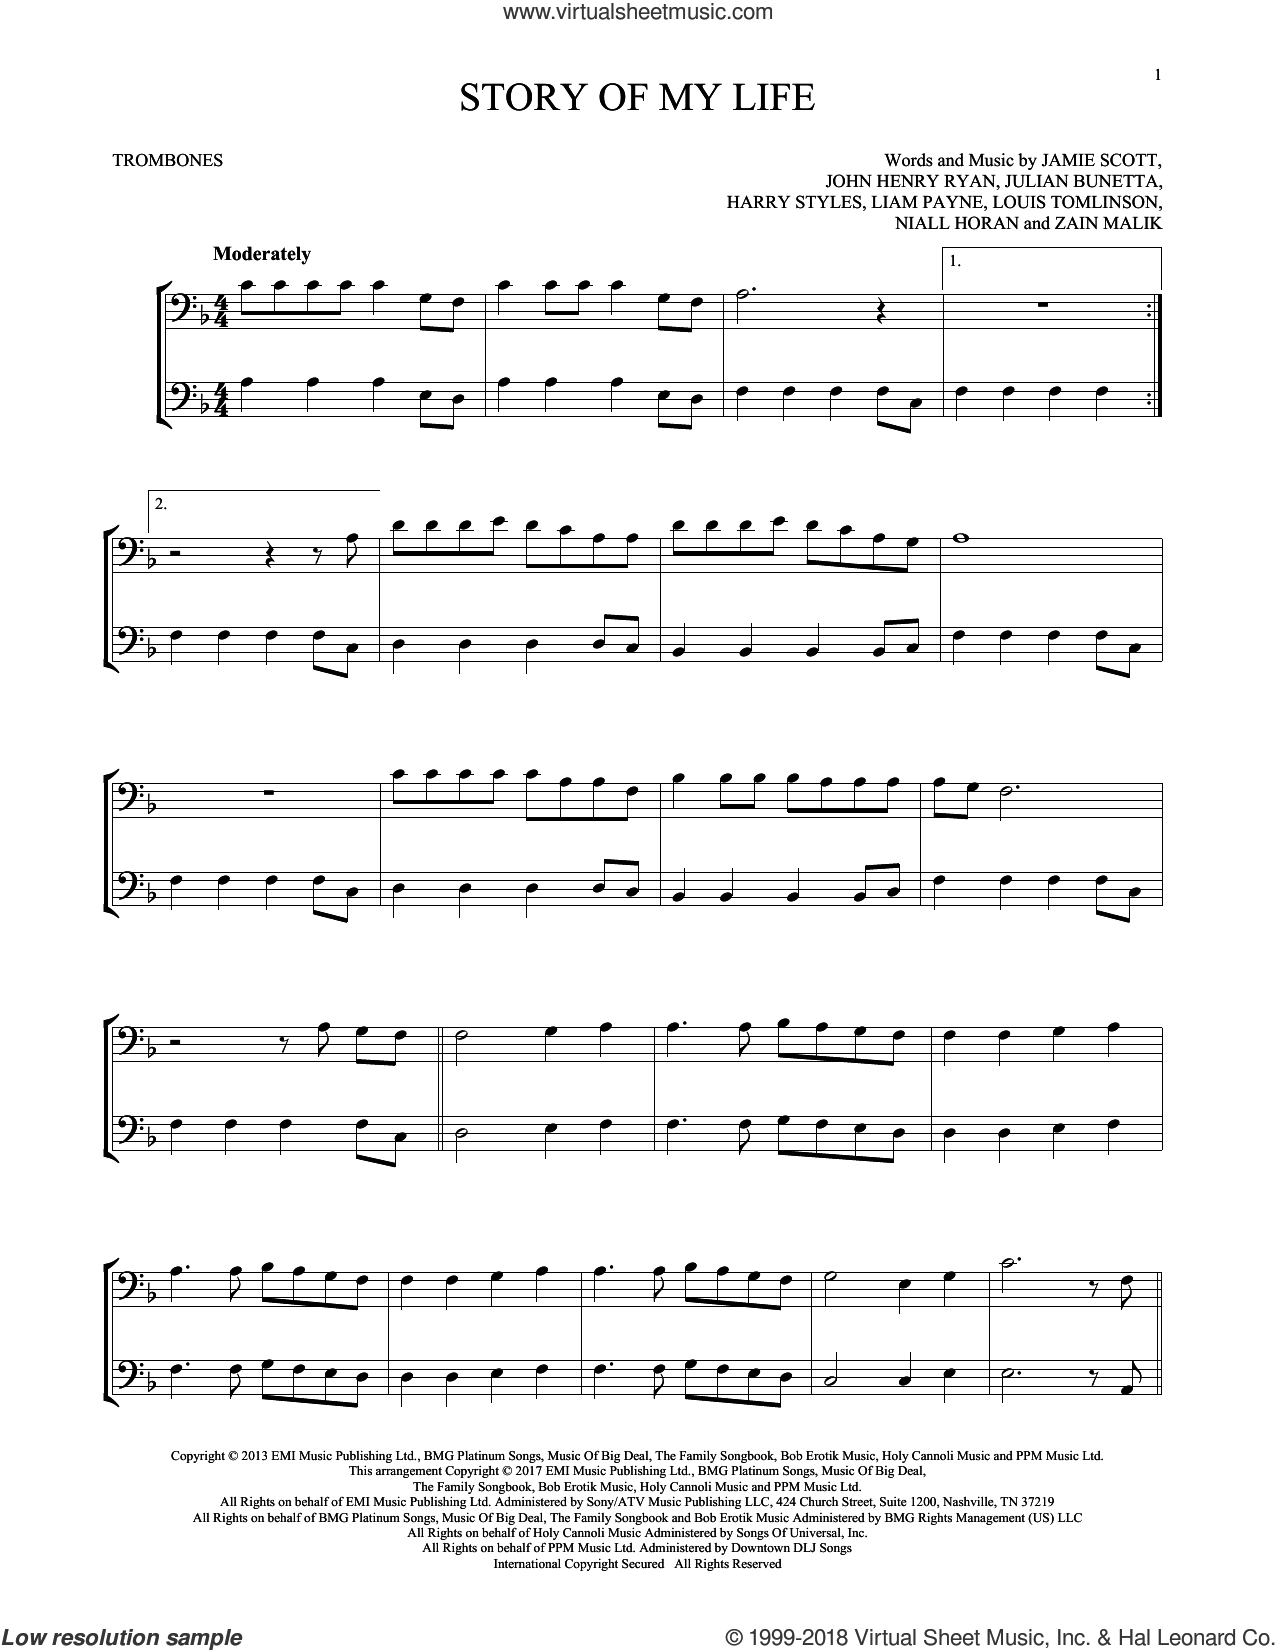 Story Of My Life sheet music for two trombones (duet, duets) by One Direction, Harry Styles, Jamie Scott, John Henry Ryan, Julian Bunetta, Liam Payne, Louis Tomlinson, Niall Horan and Zain Malik, intermediate skill level